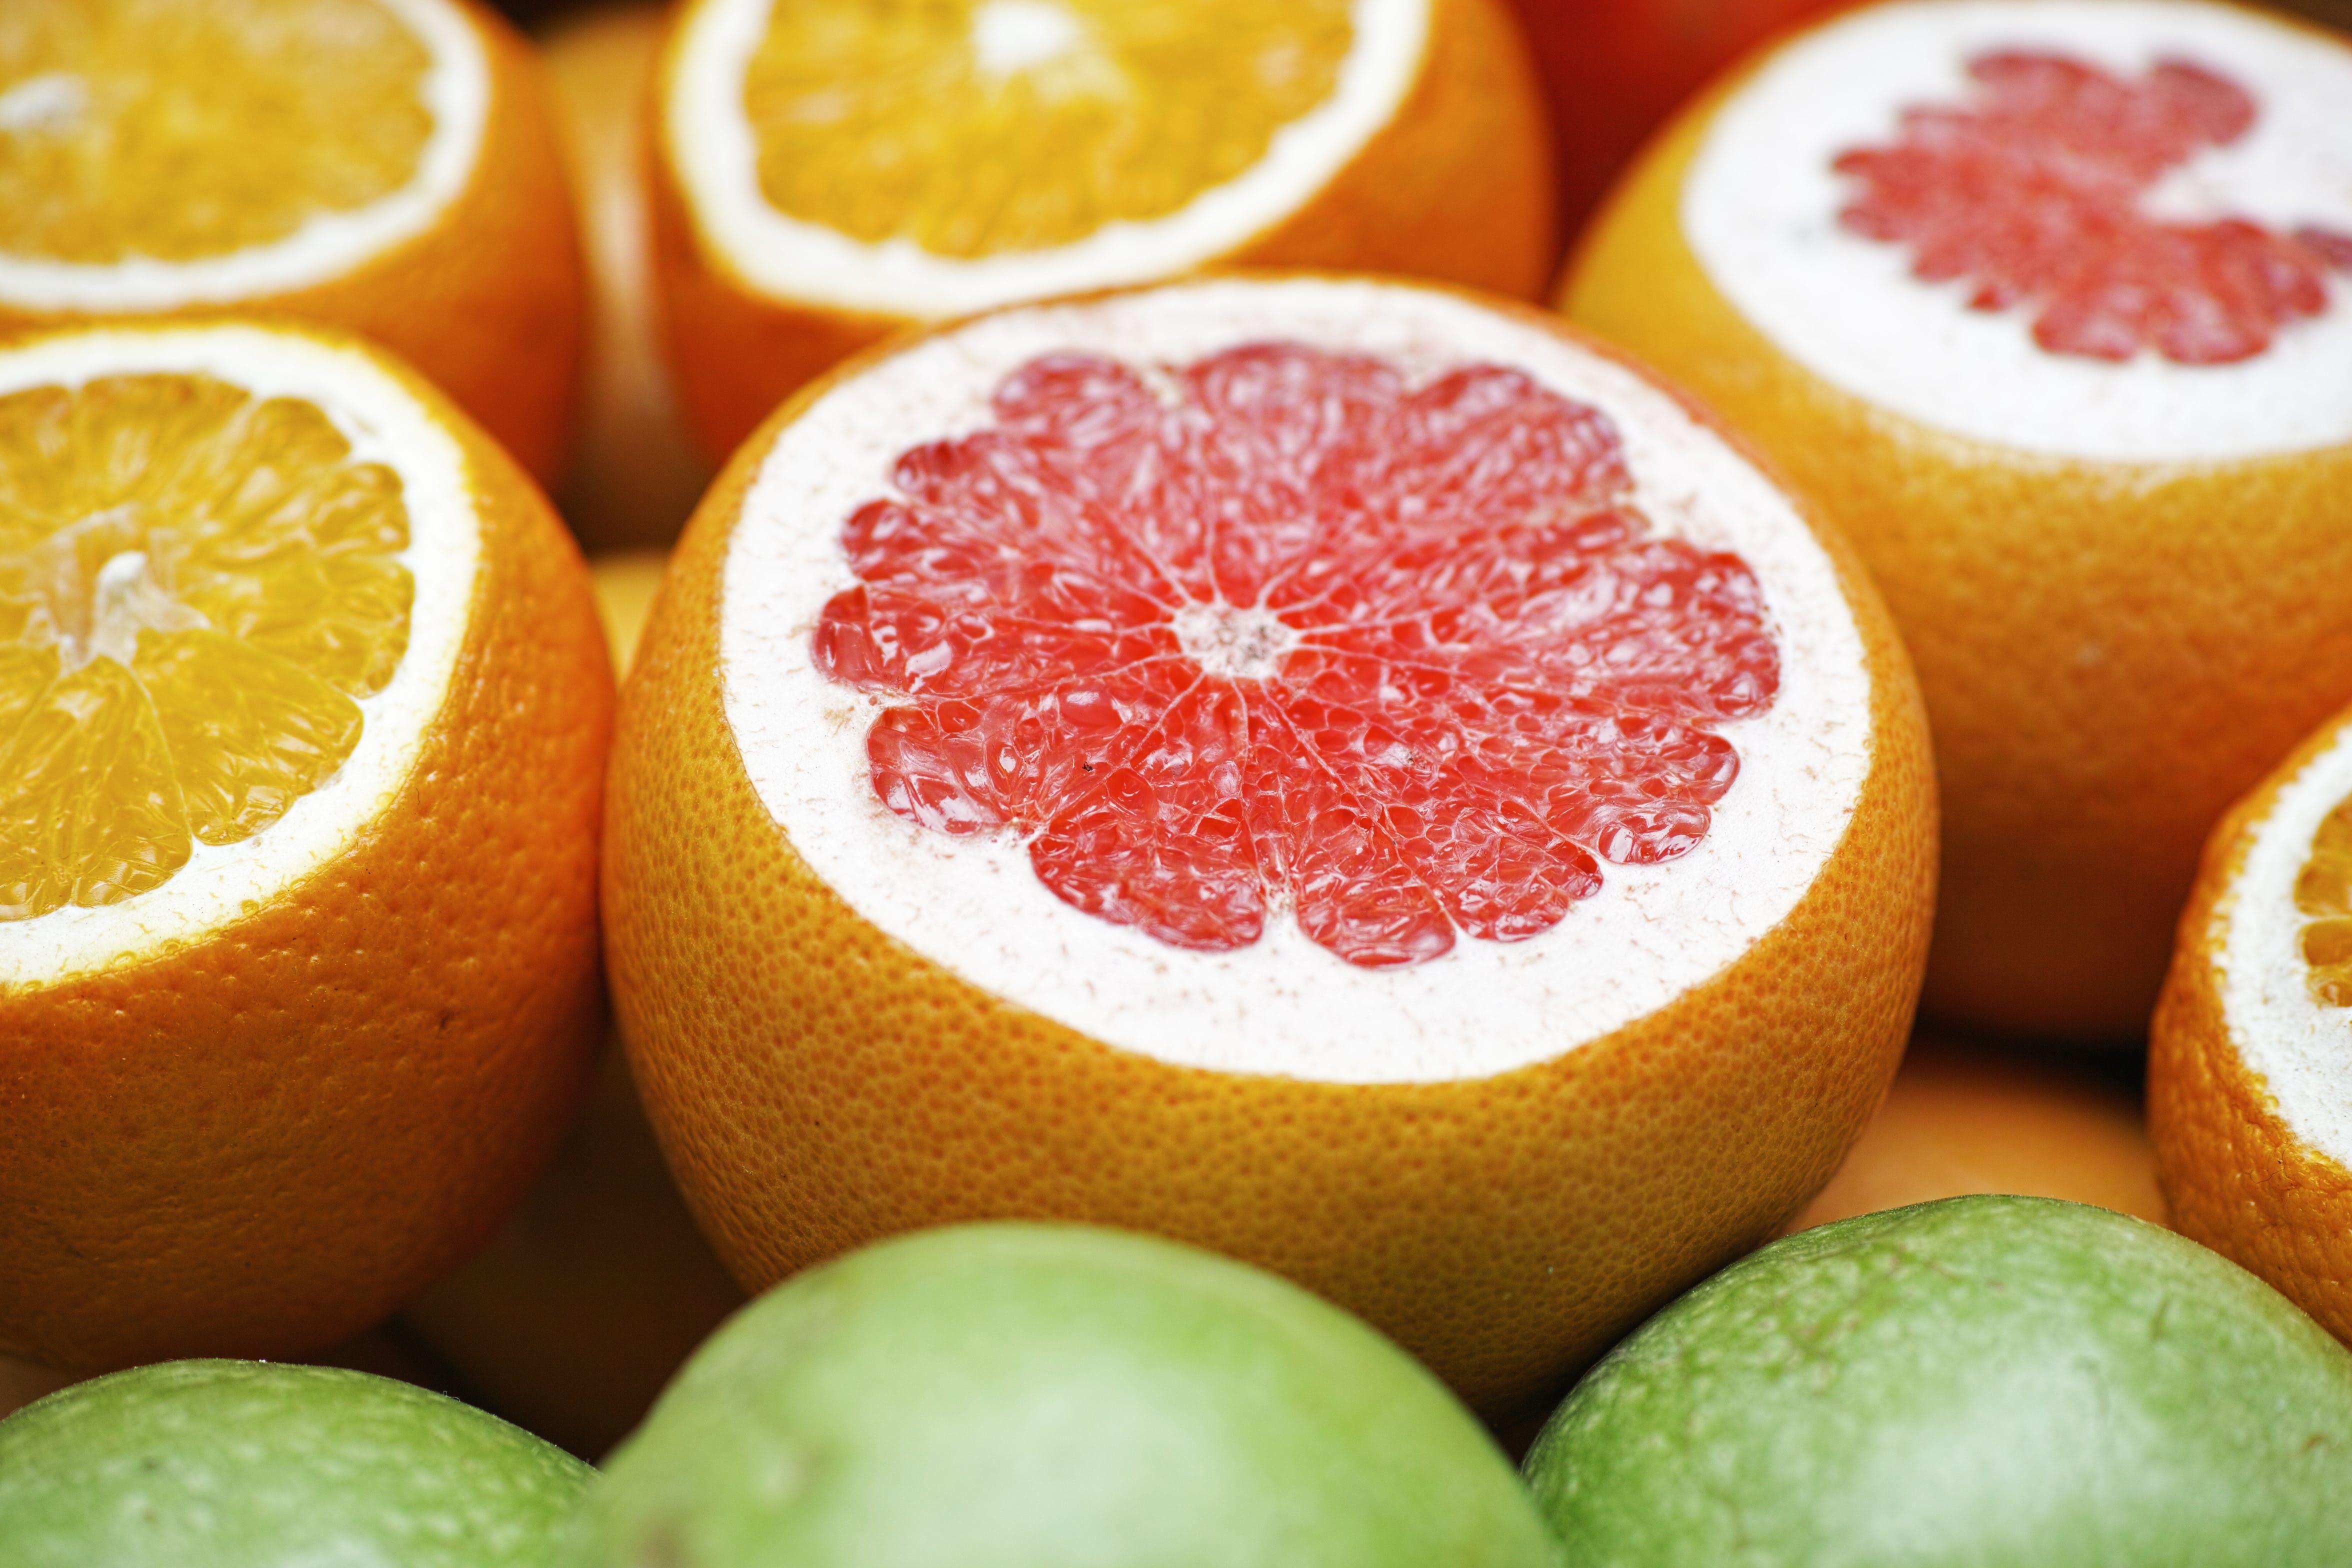 Close-up Photo of Grapefruits